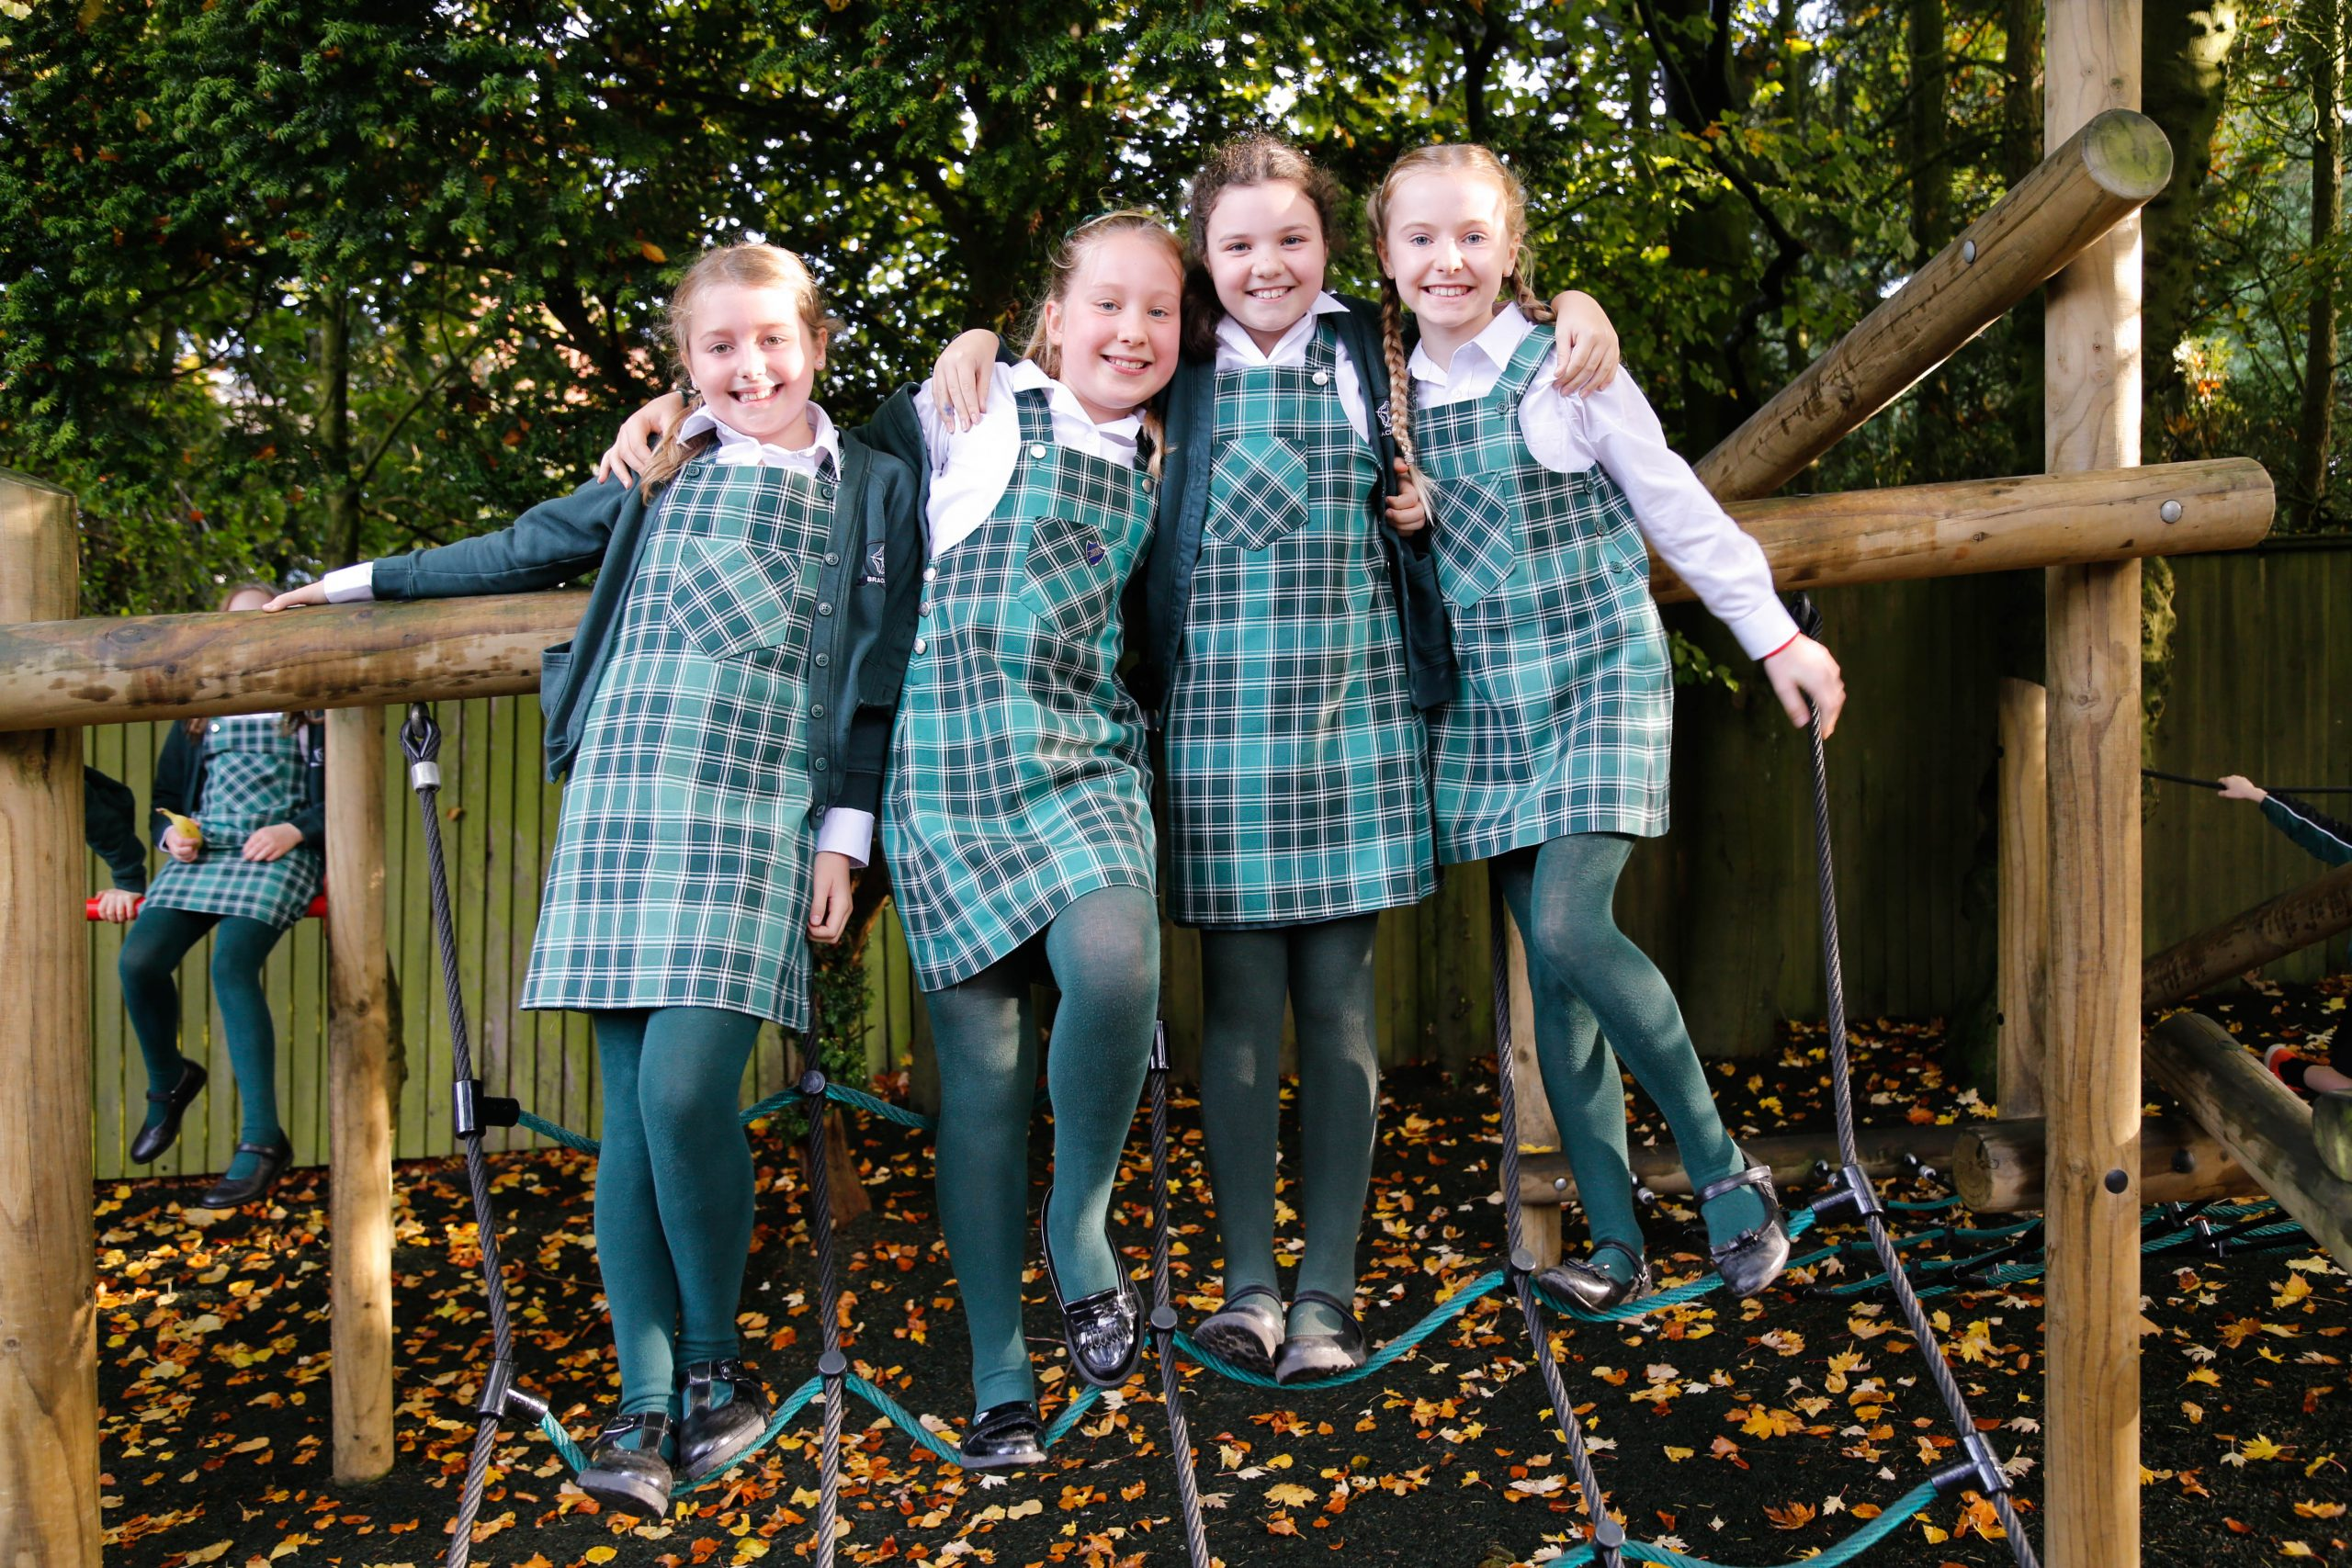 Brackenfield School – School of the Week